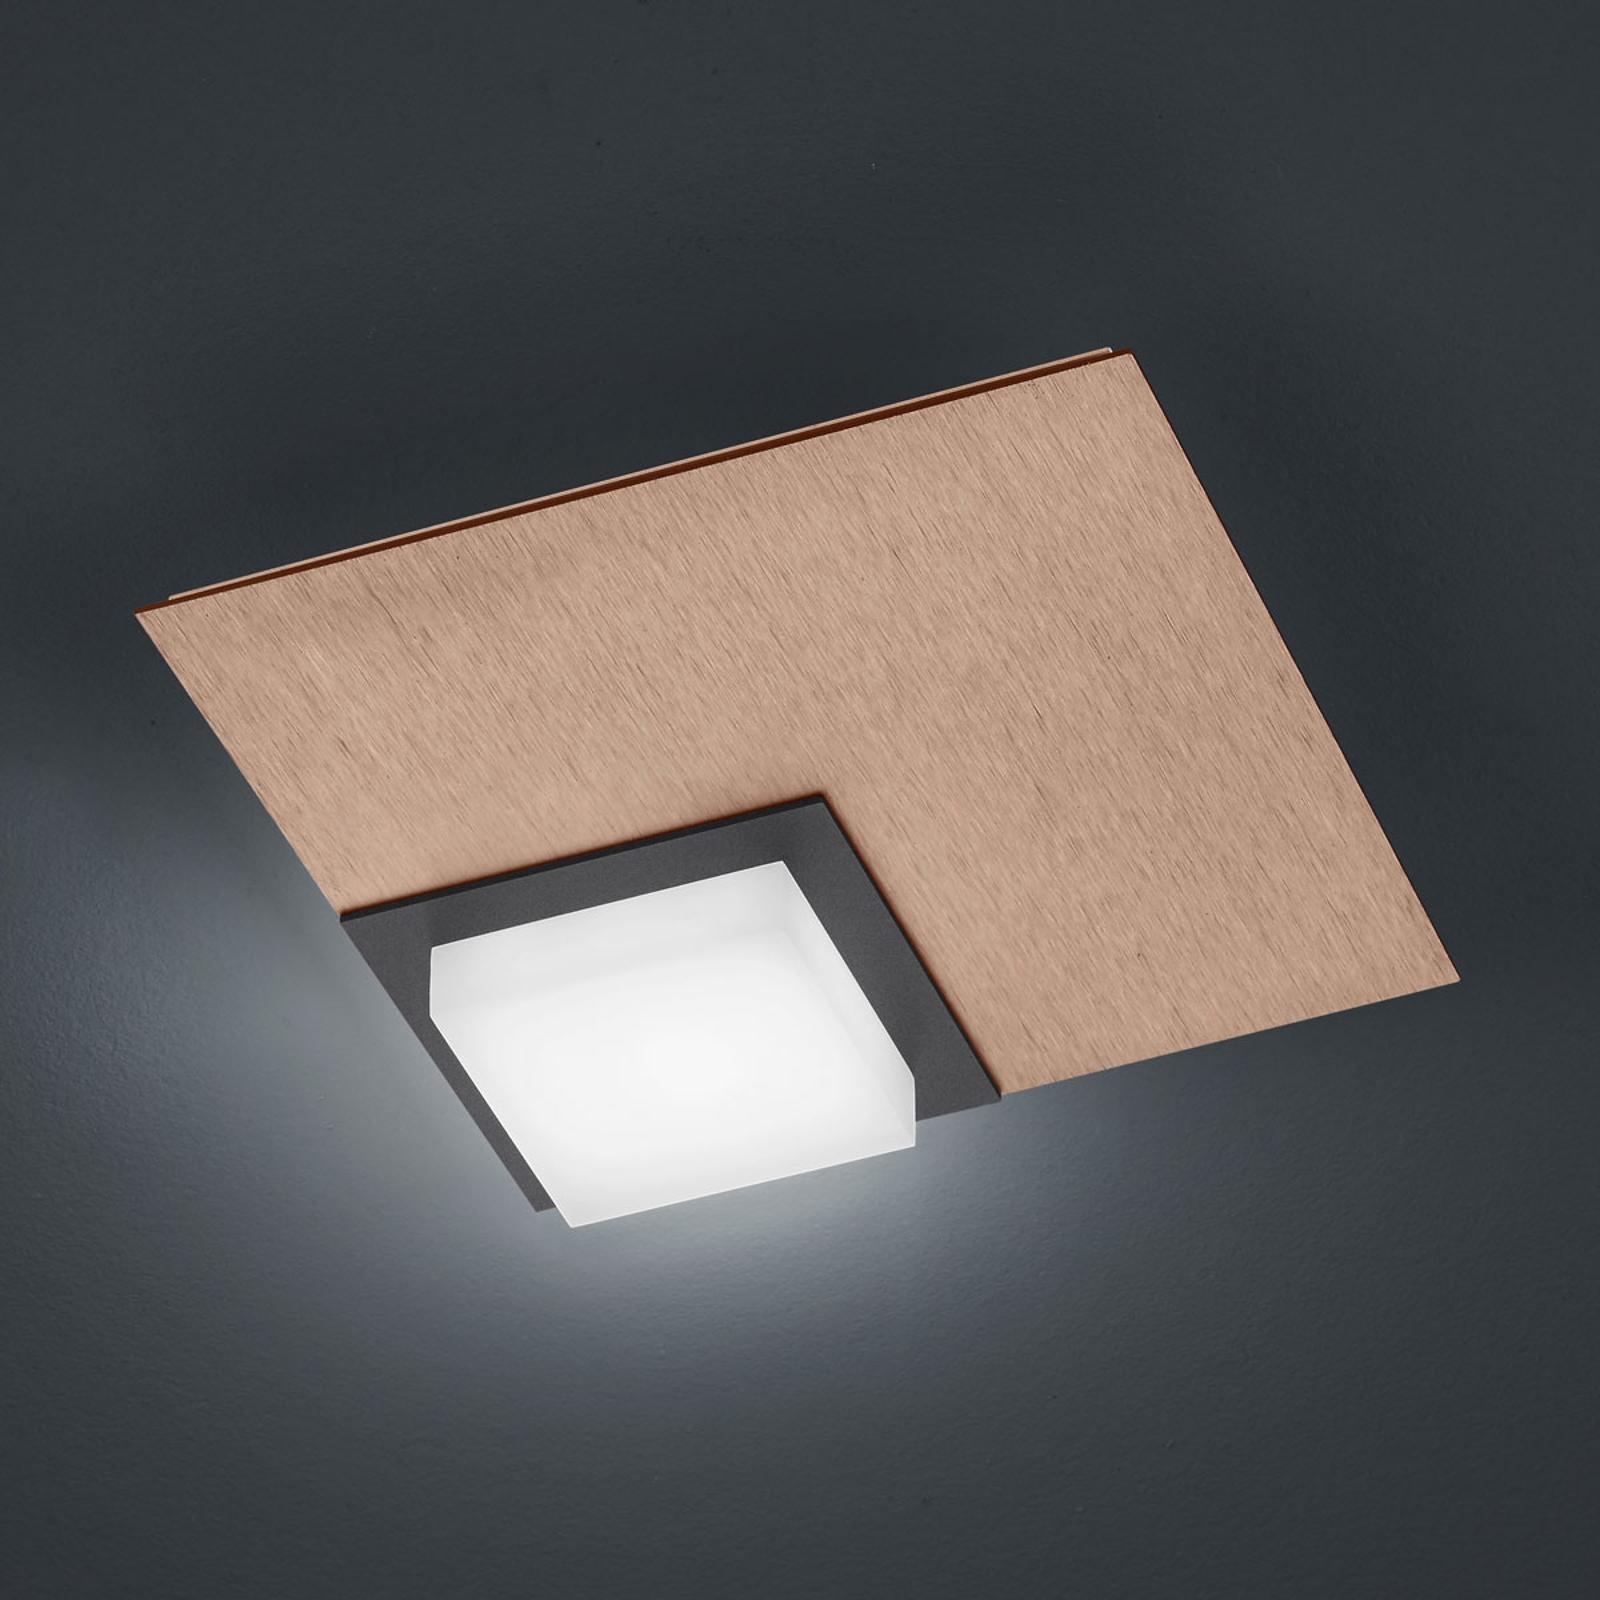 BANKAMP Quadro LED-taklampe 8W roségull